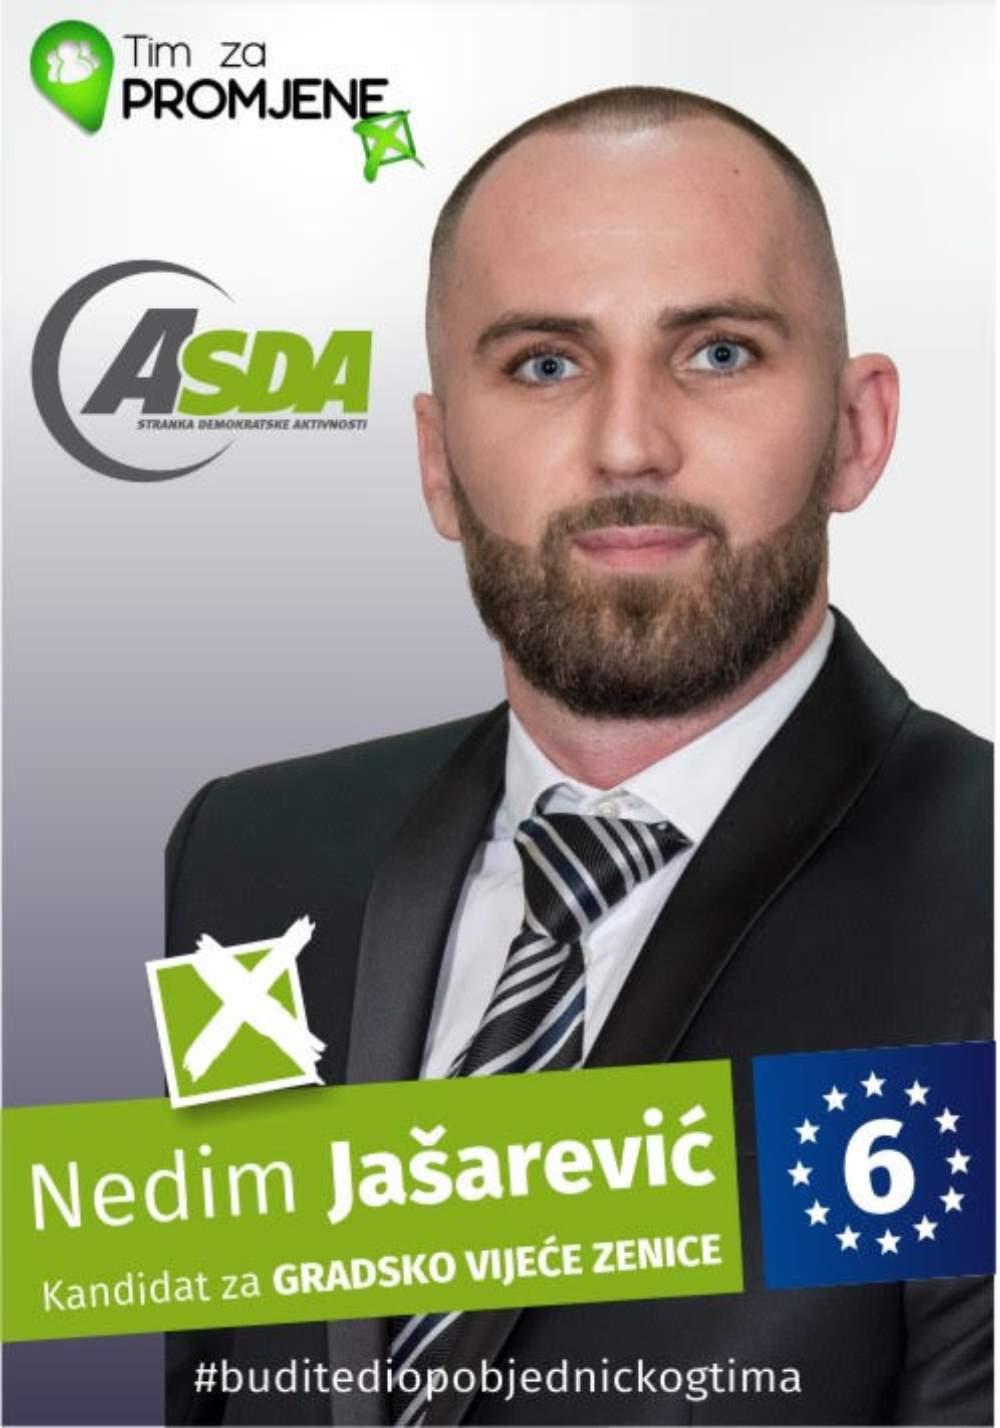 Nedim Jašarević